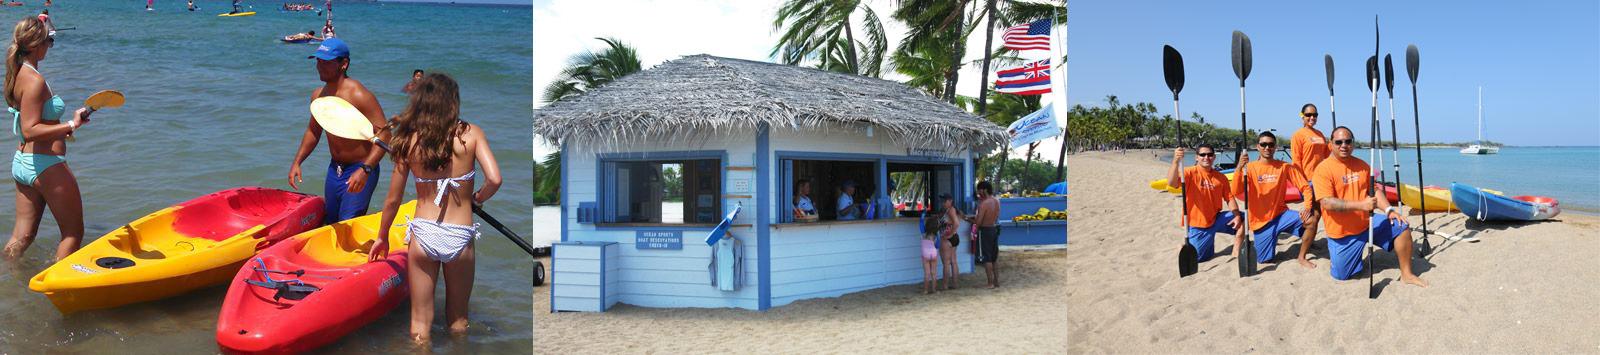 Beach Toys at Anaeho'omalu Bay - Hawaii Ocean Sports